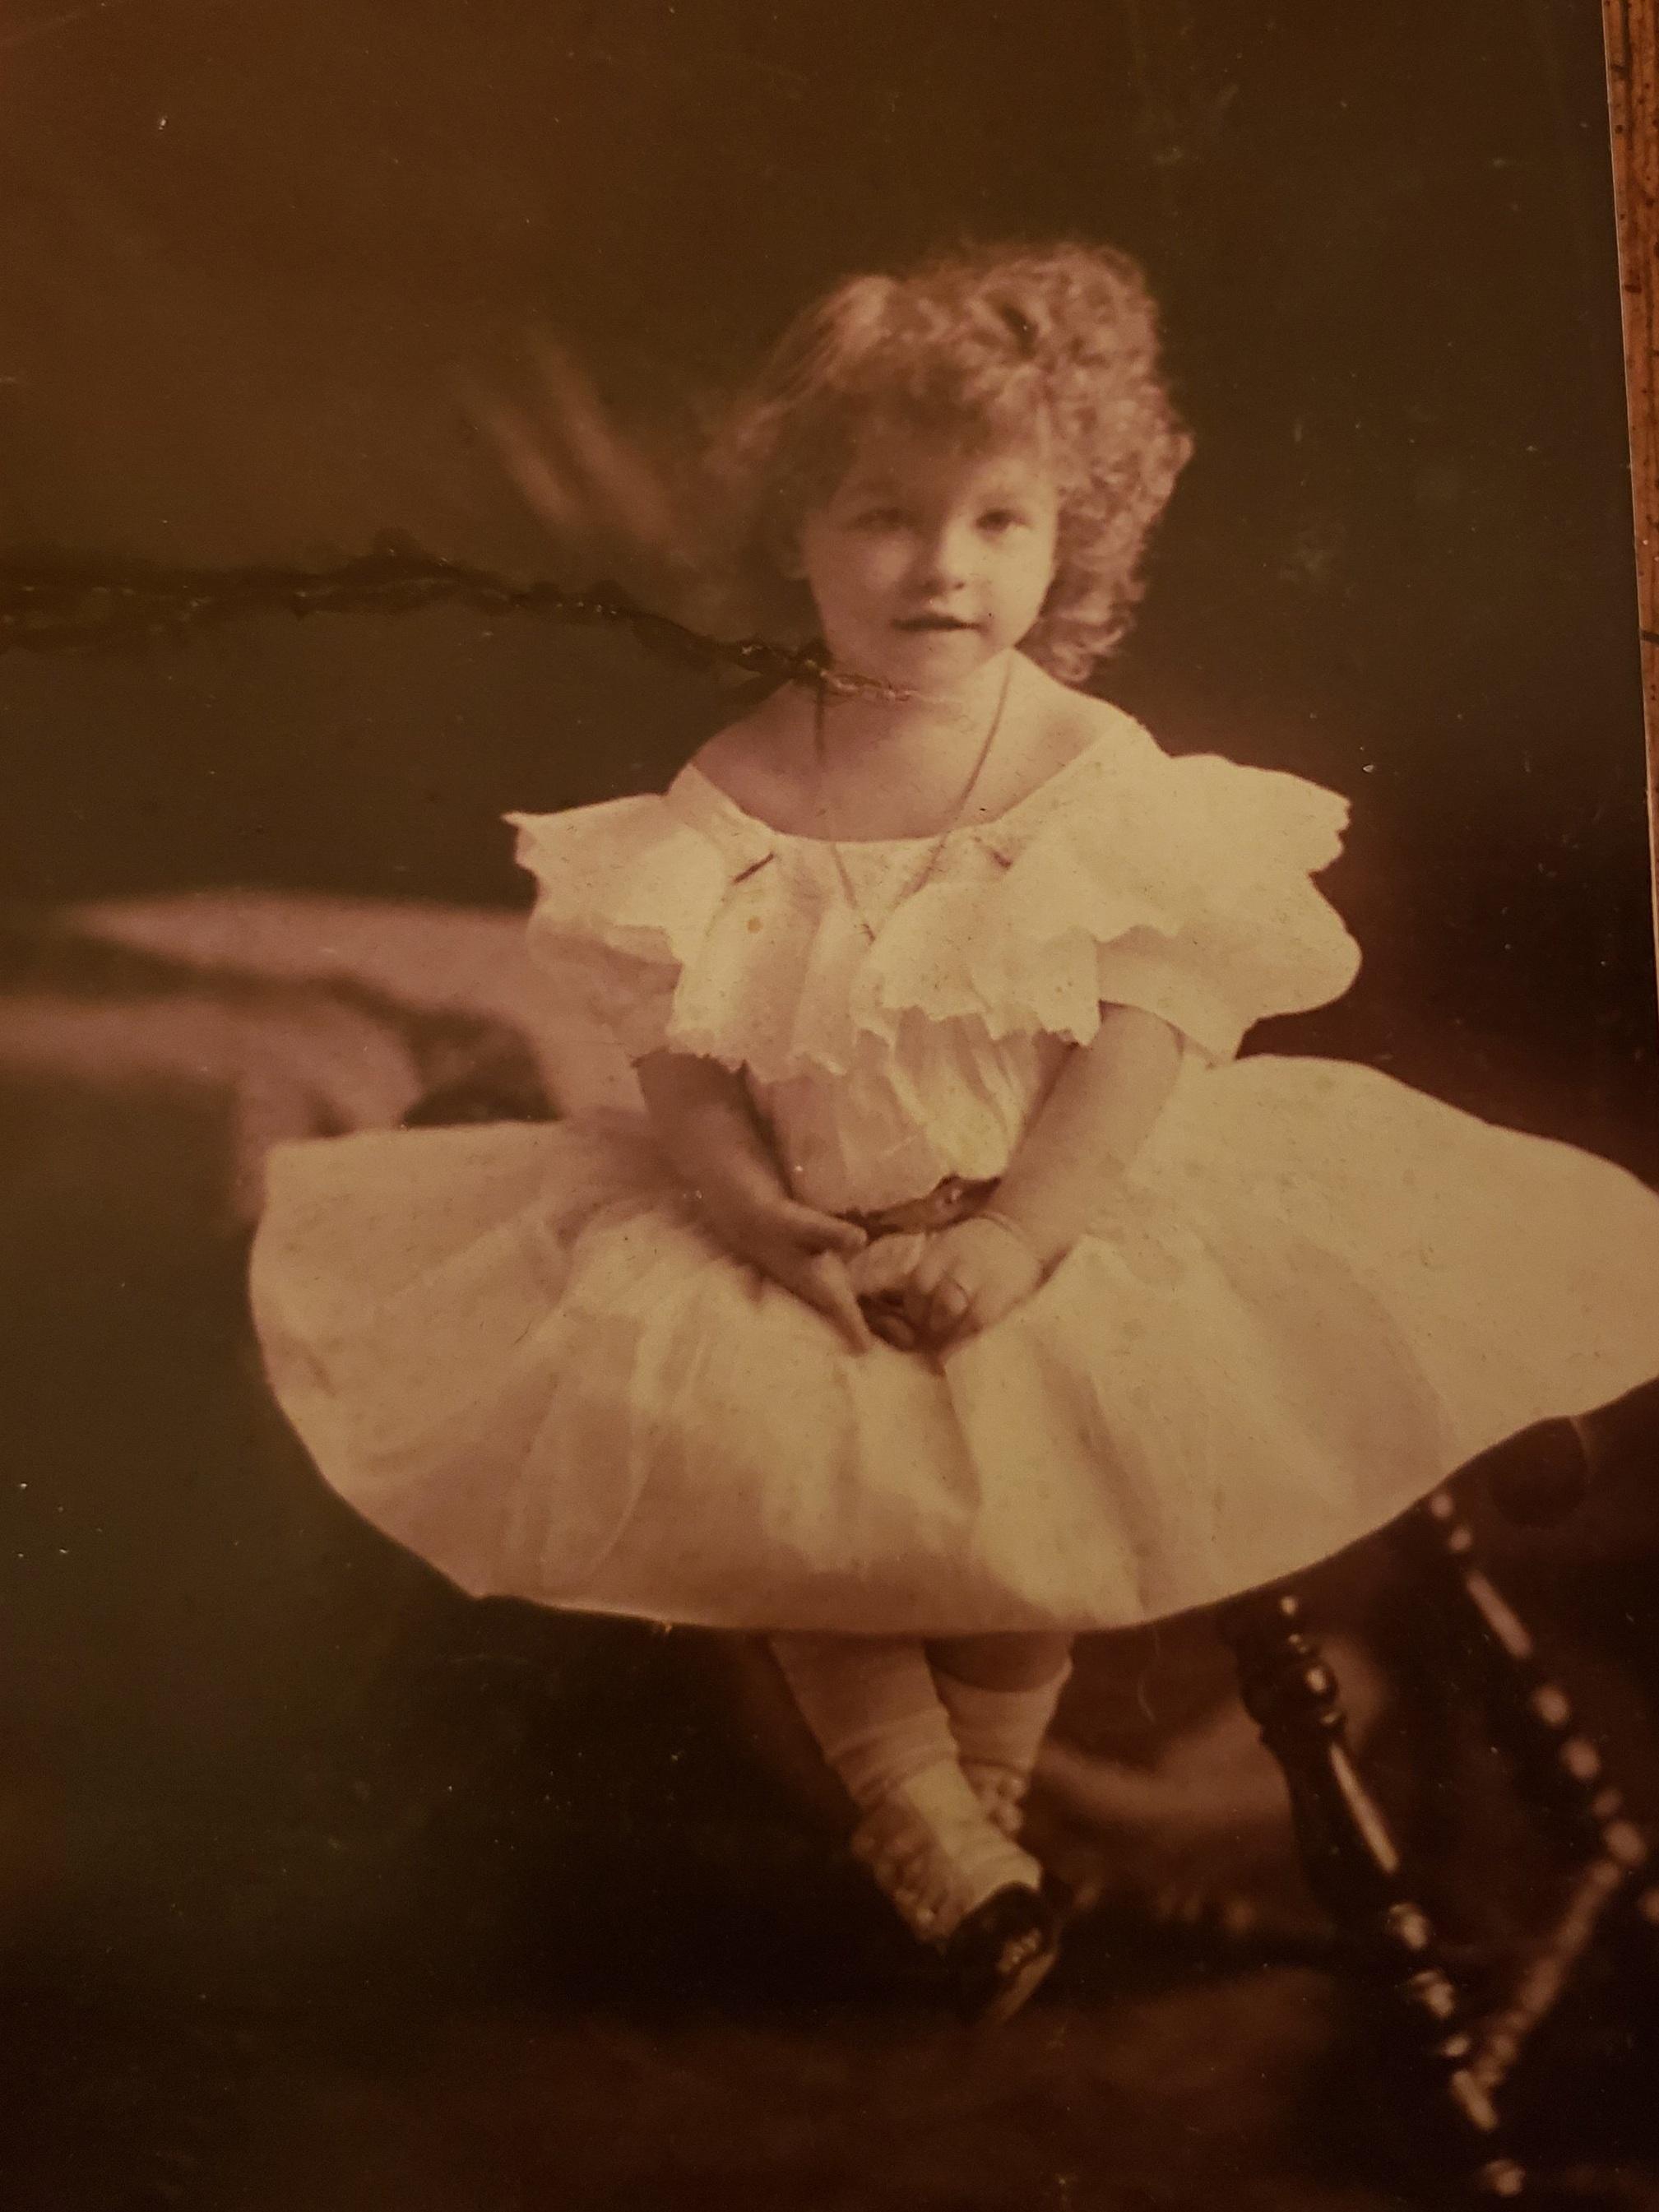 My maternal grandmother, Marion. Her hair! That dress! The little high-button boots!